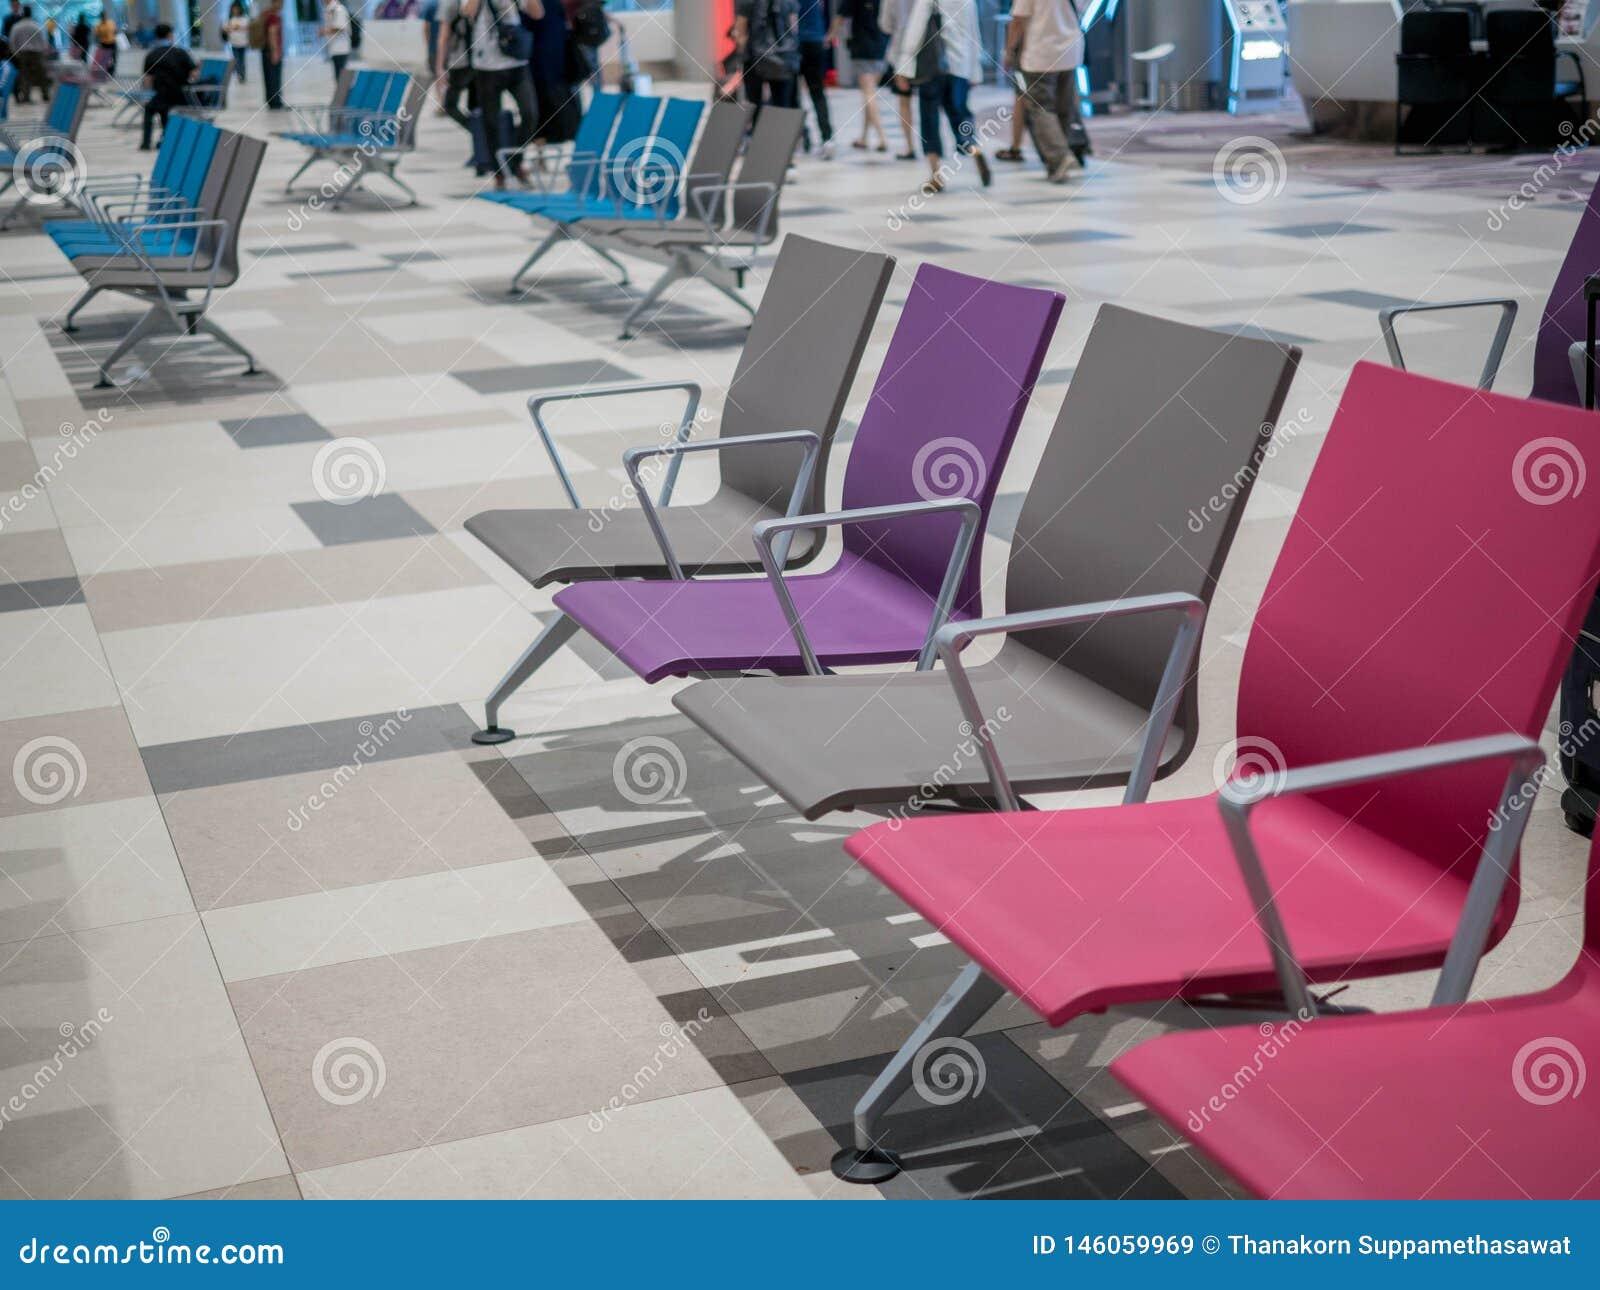 Singapore, Changi Airport - NOV 22, 2018: The Waiting Hall